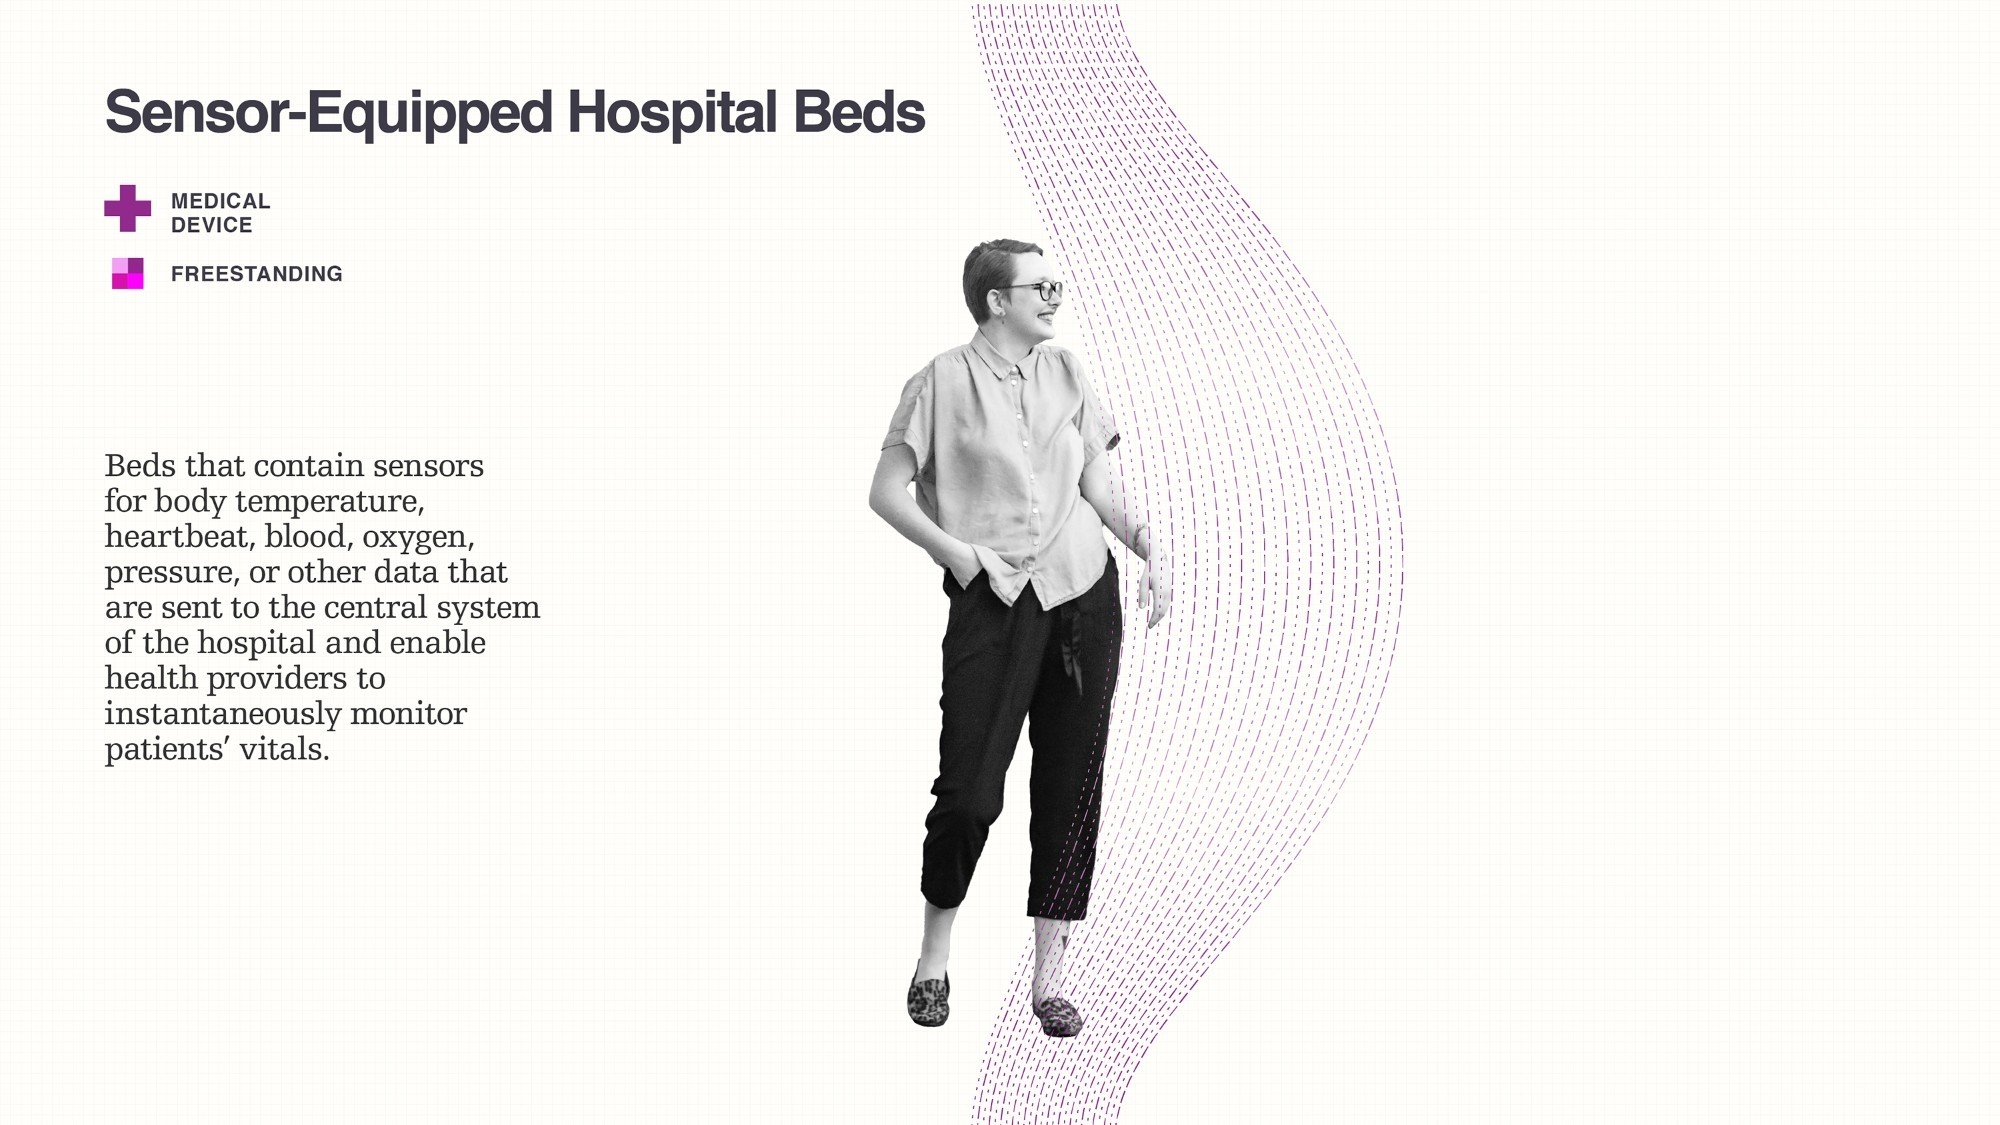 Data visualization illustrating sensor-equipped hospital beds by Gioriga Lupi.